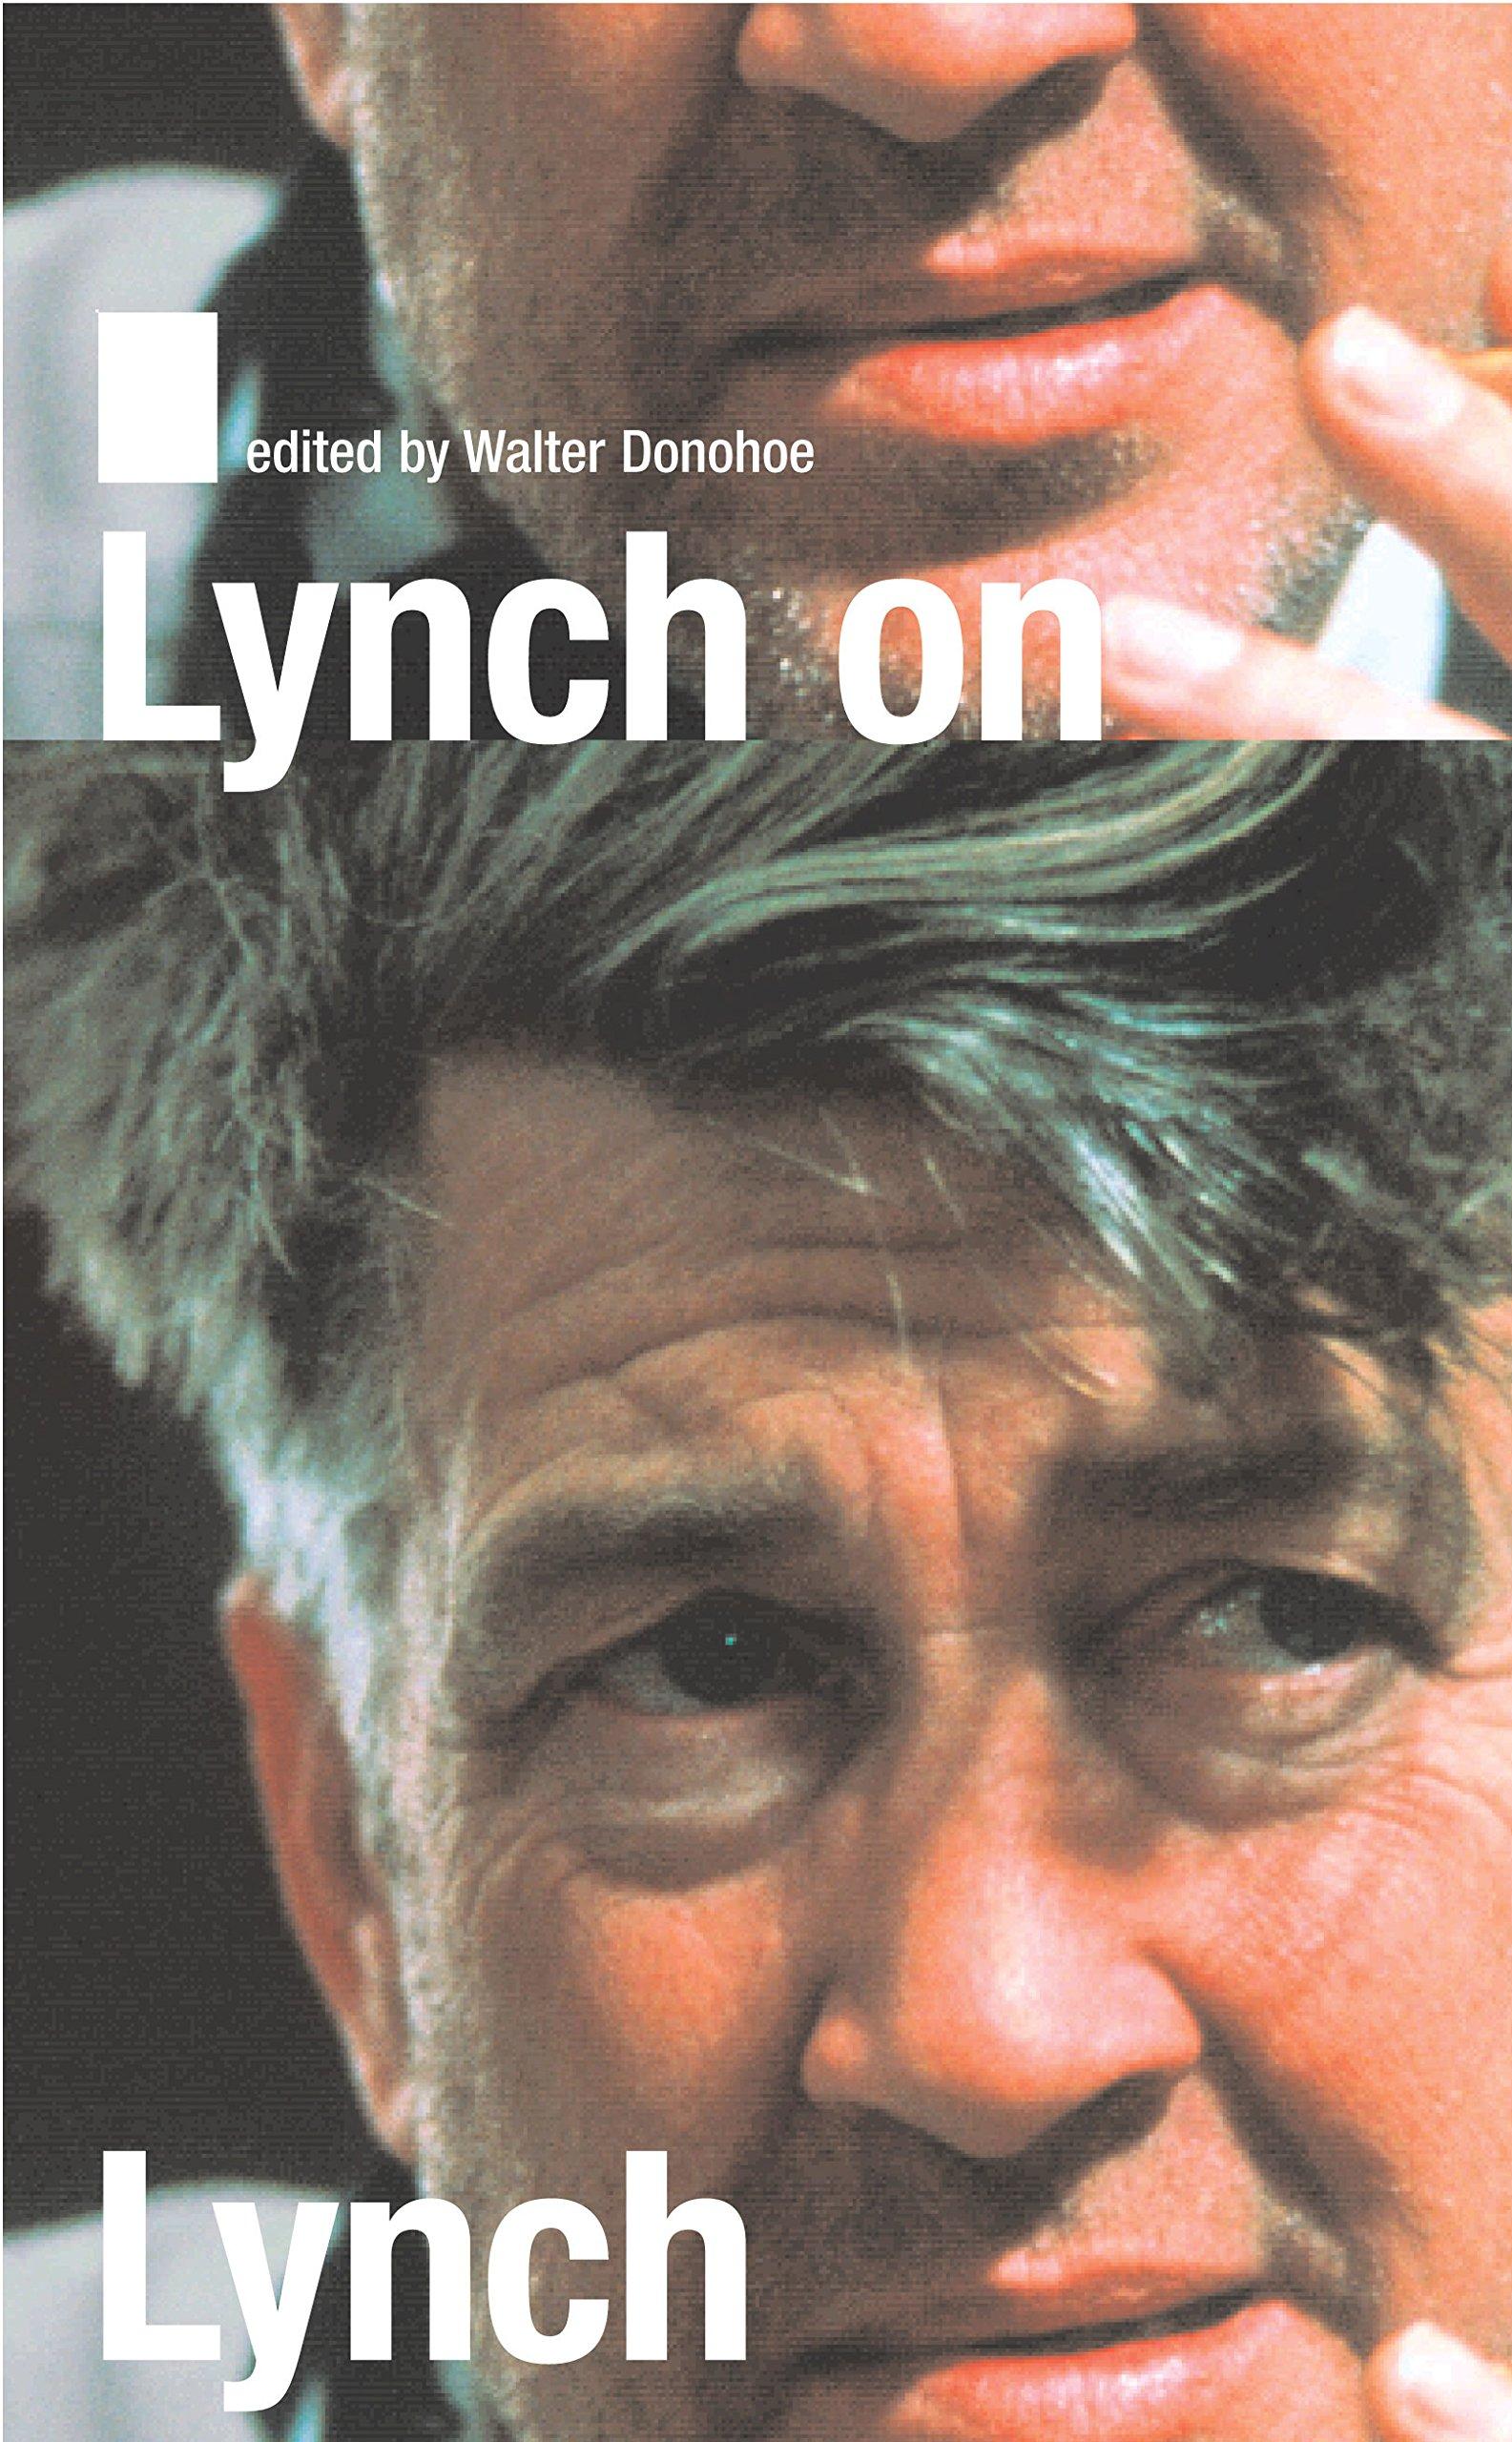 david lynch book